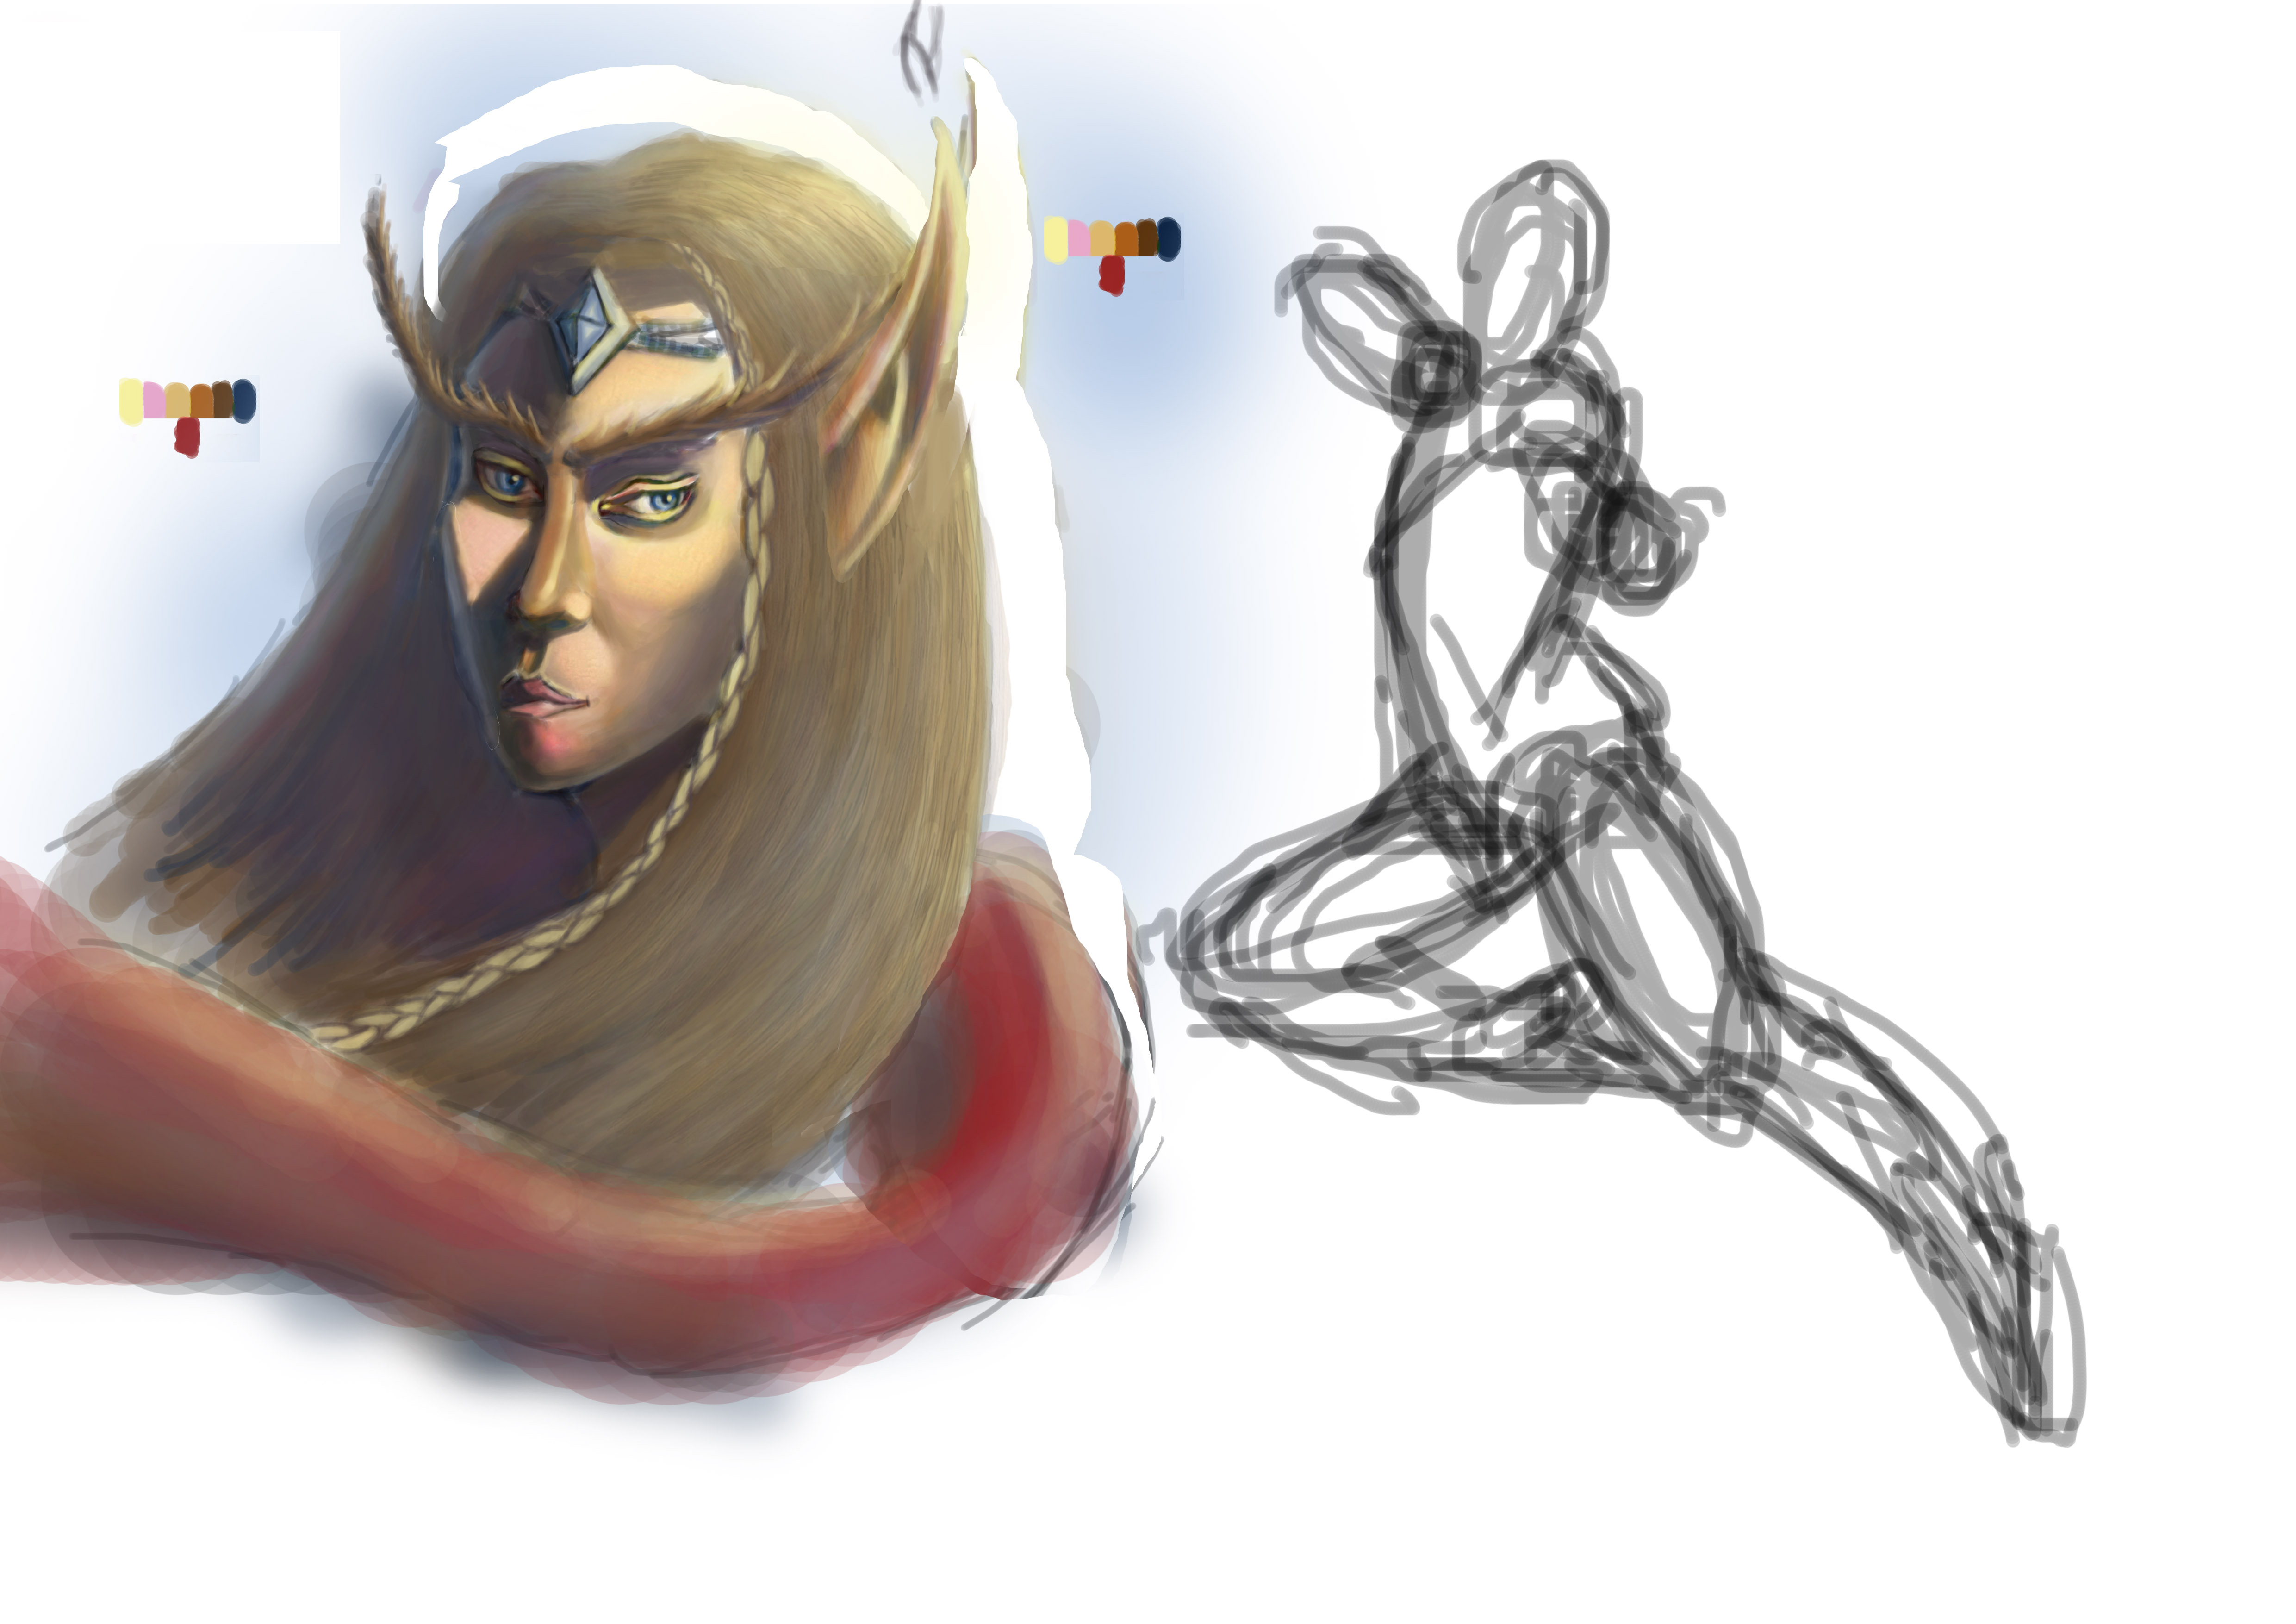 http://xgm.guru/p/art/blayderman-archer